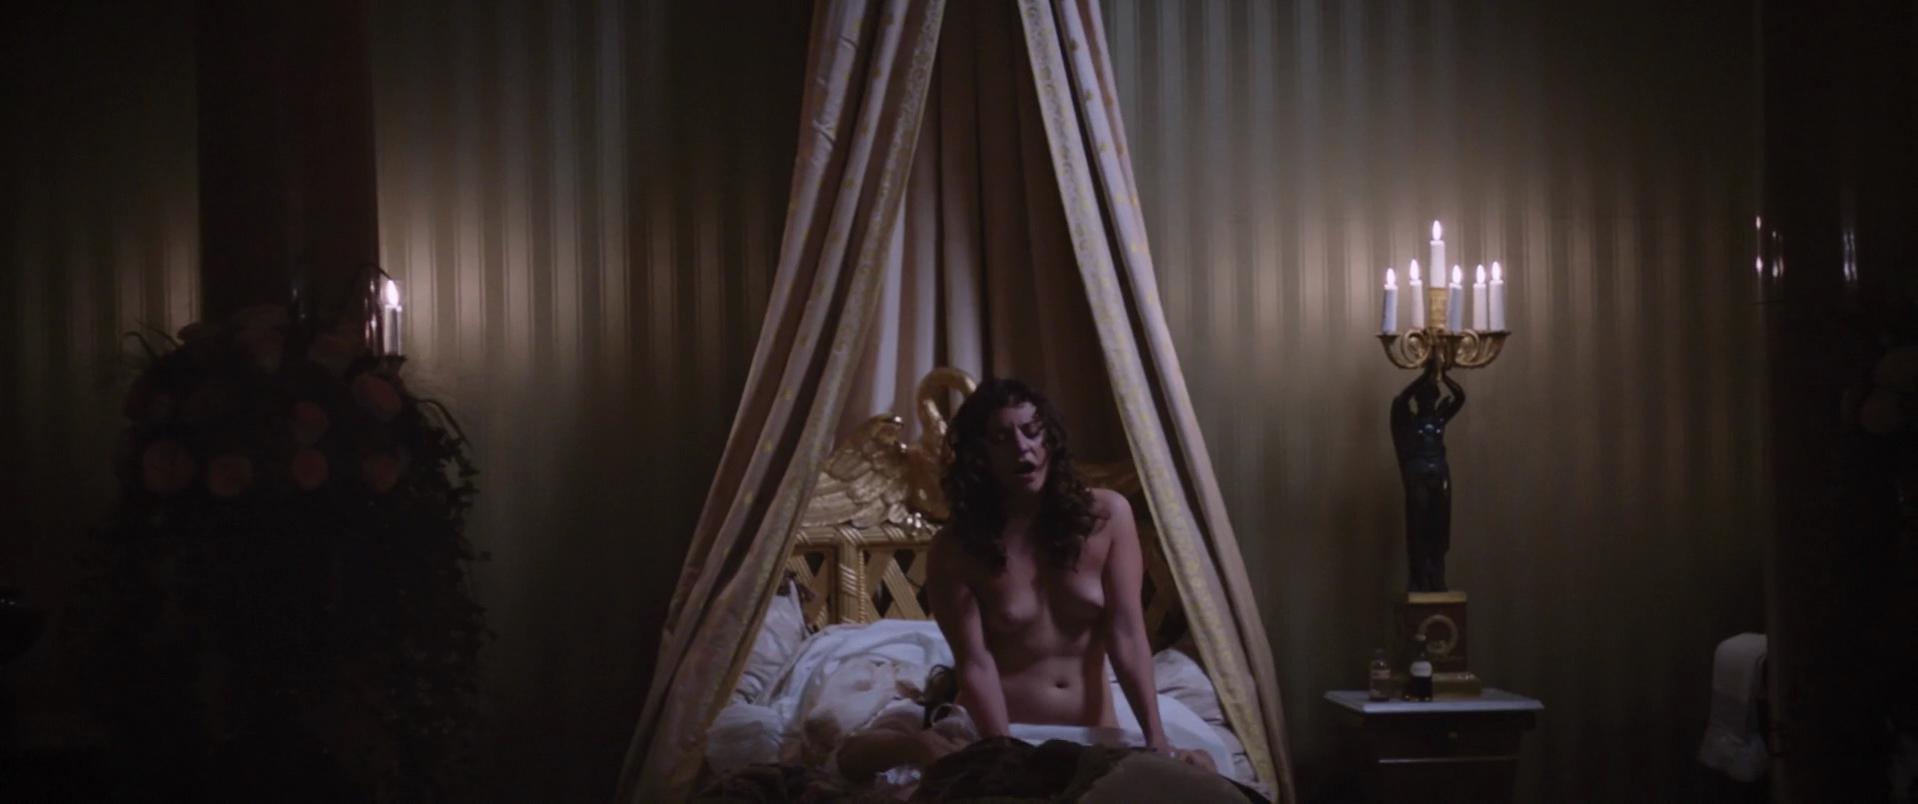 Jennifer Davison nude, Ania Sowinski nude, Franziska Weisz nude - The Devil's Violinist (2013)